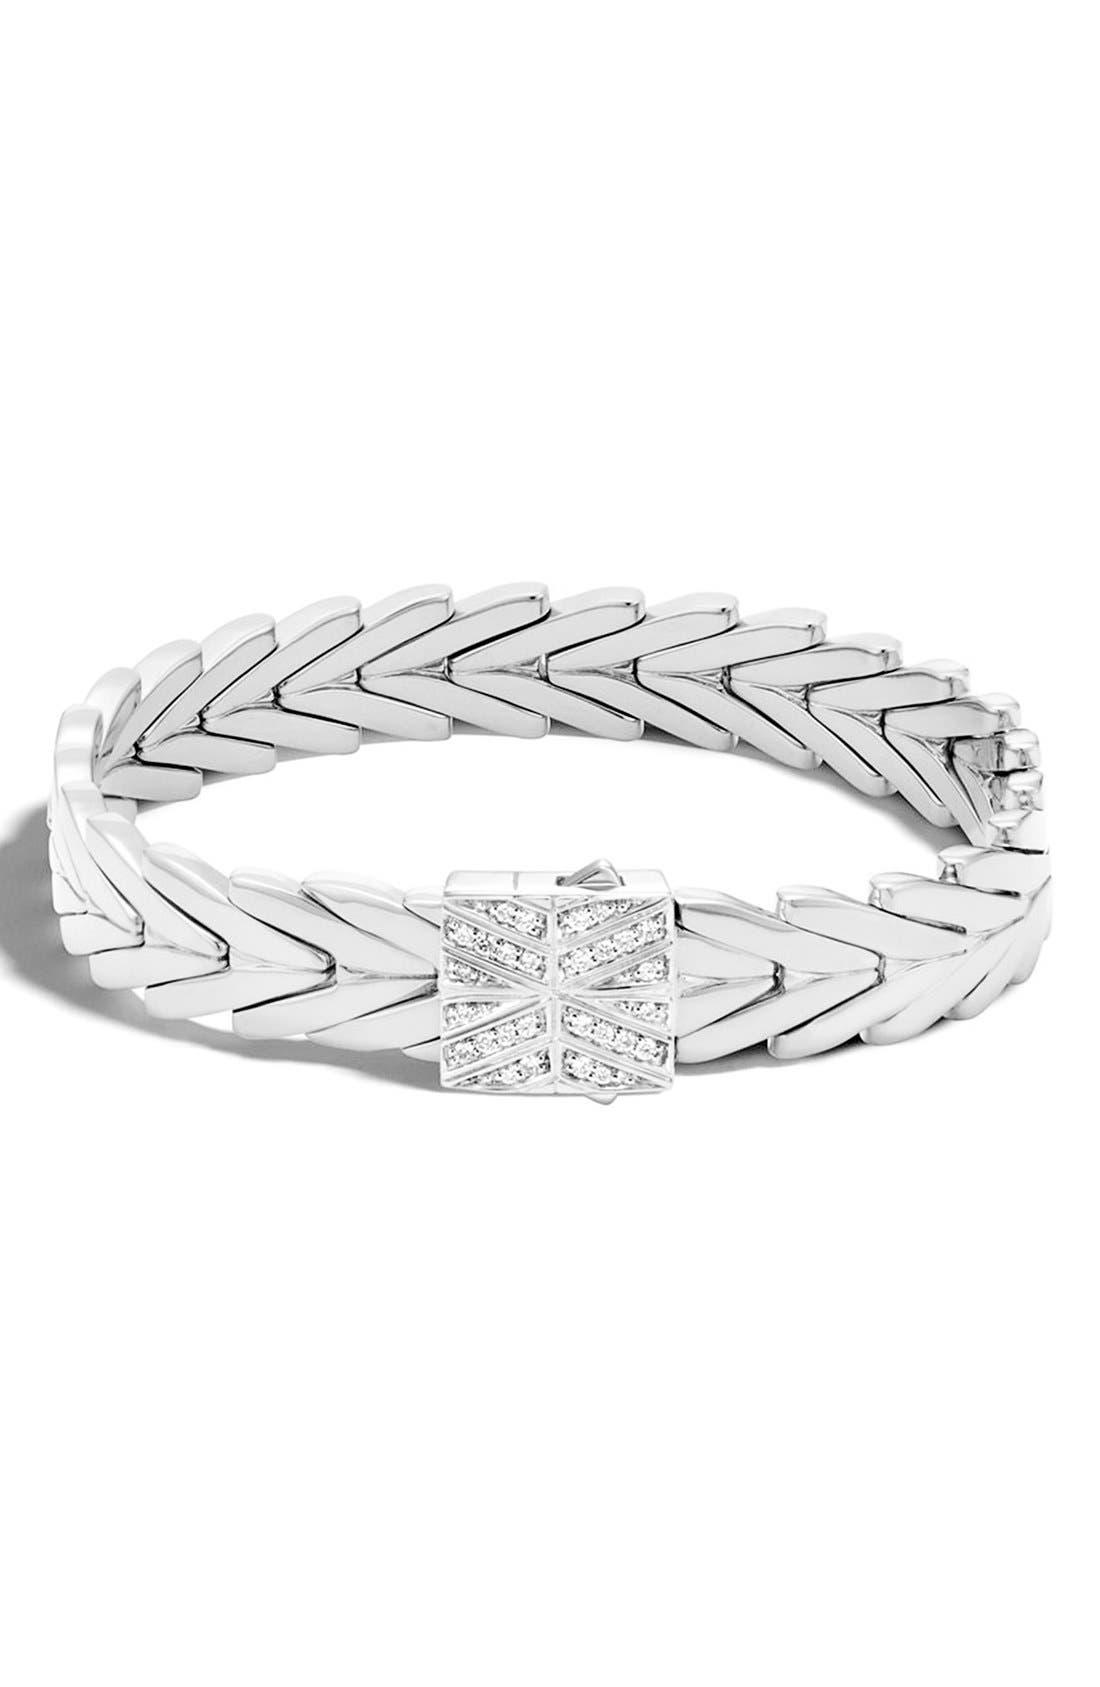 Main Image - John Hardy 'Classic' Link Bracelet